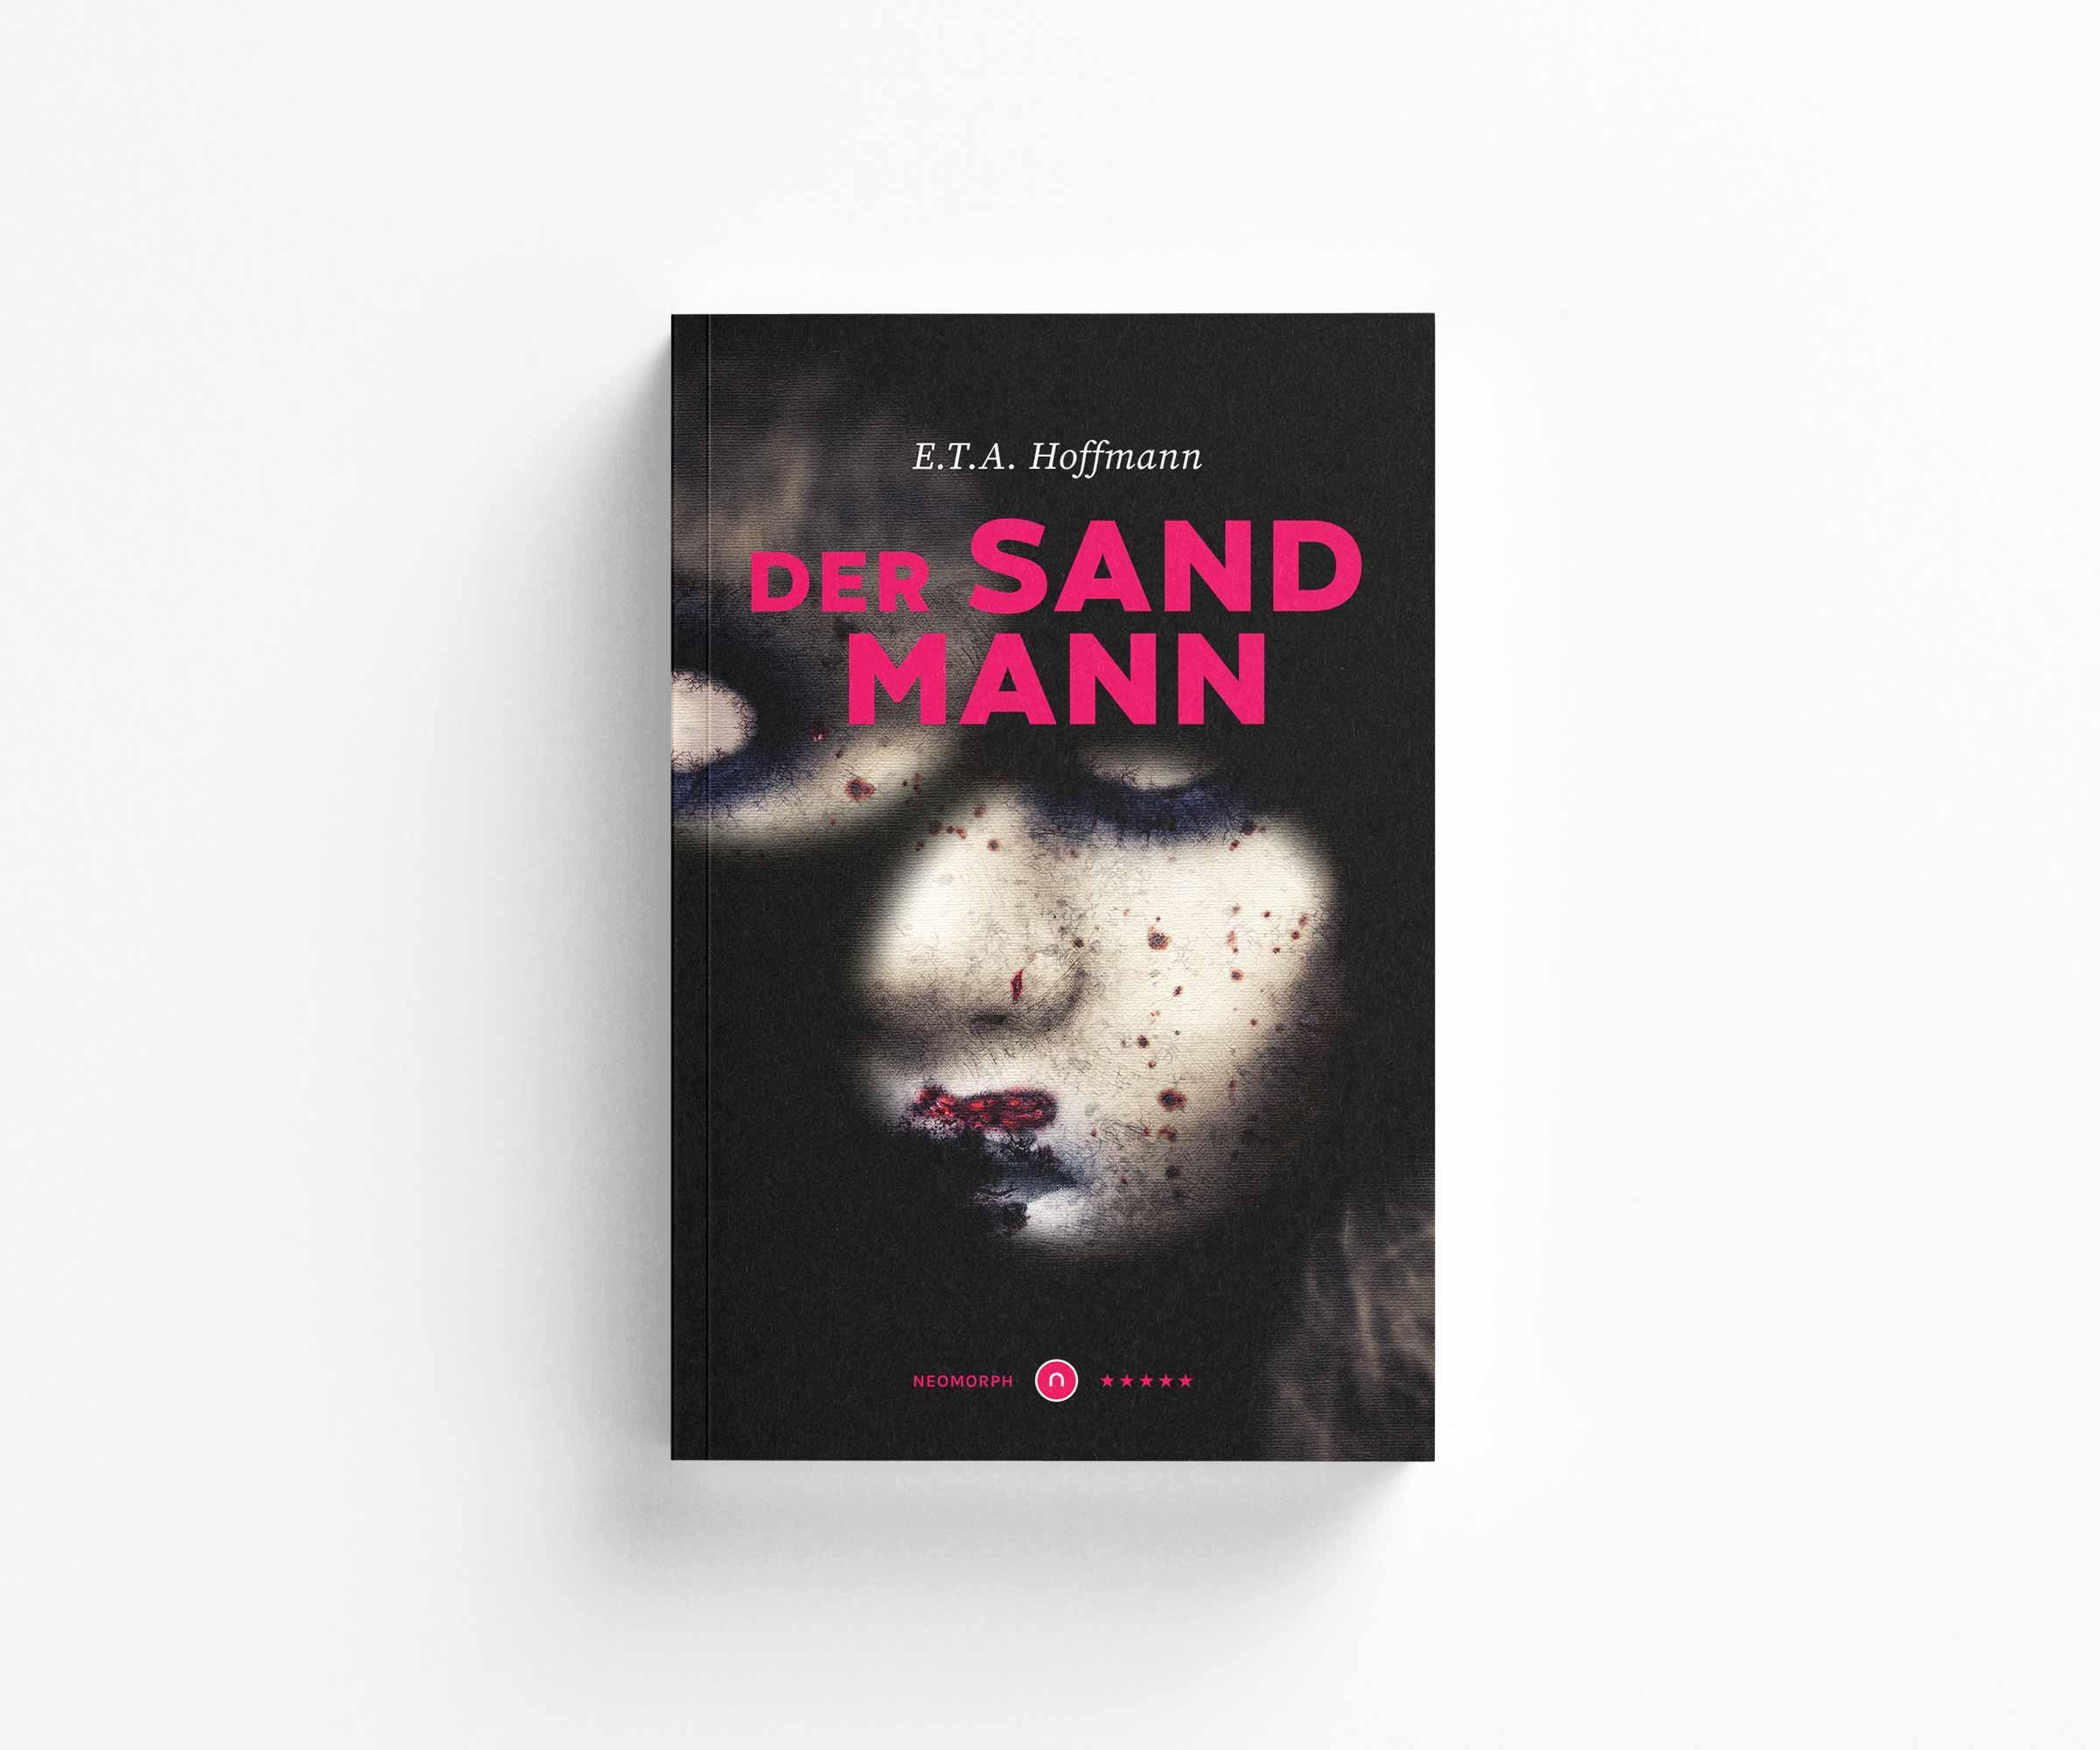 Elegant Bookcover Design: Der Sandmann [E.T.A. Hoffmann] Neomorph Design -Edition